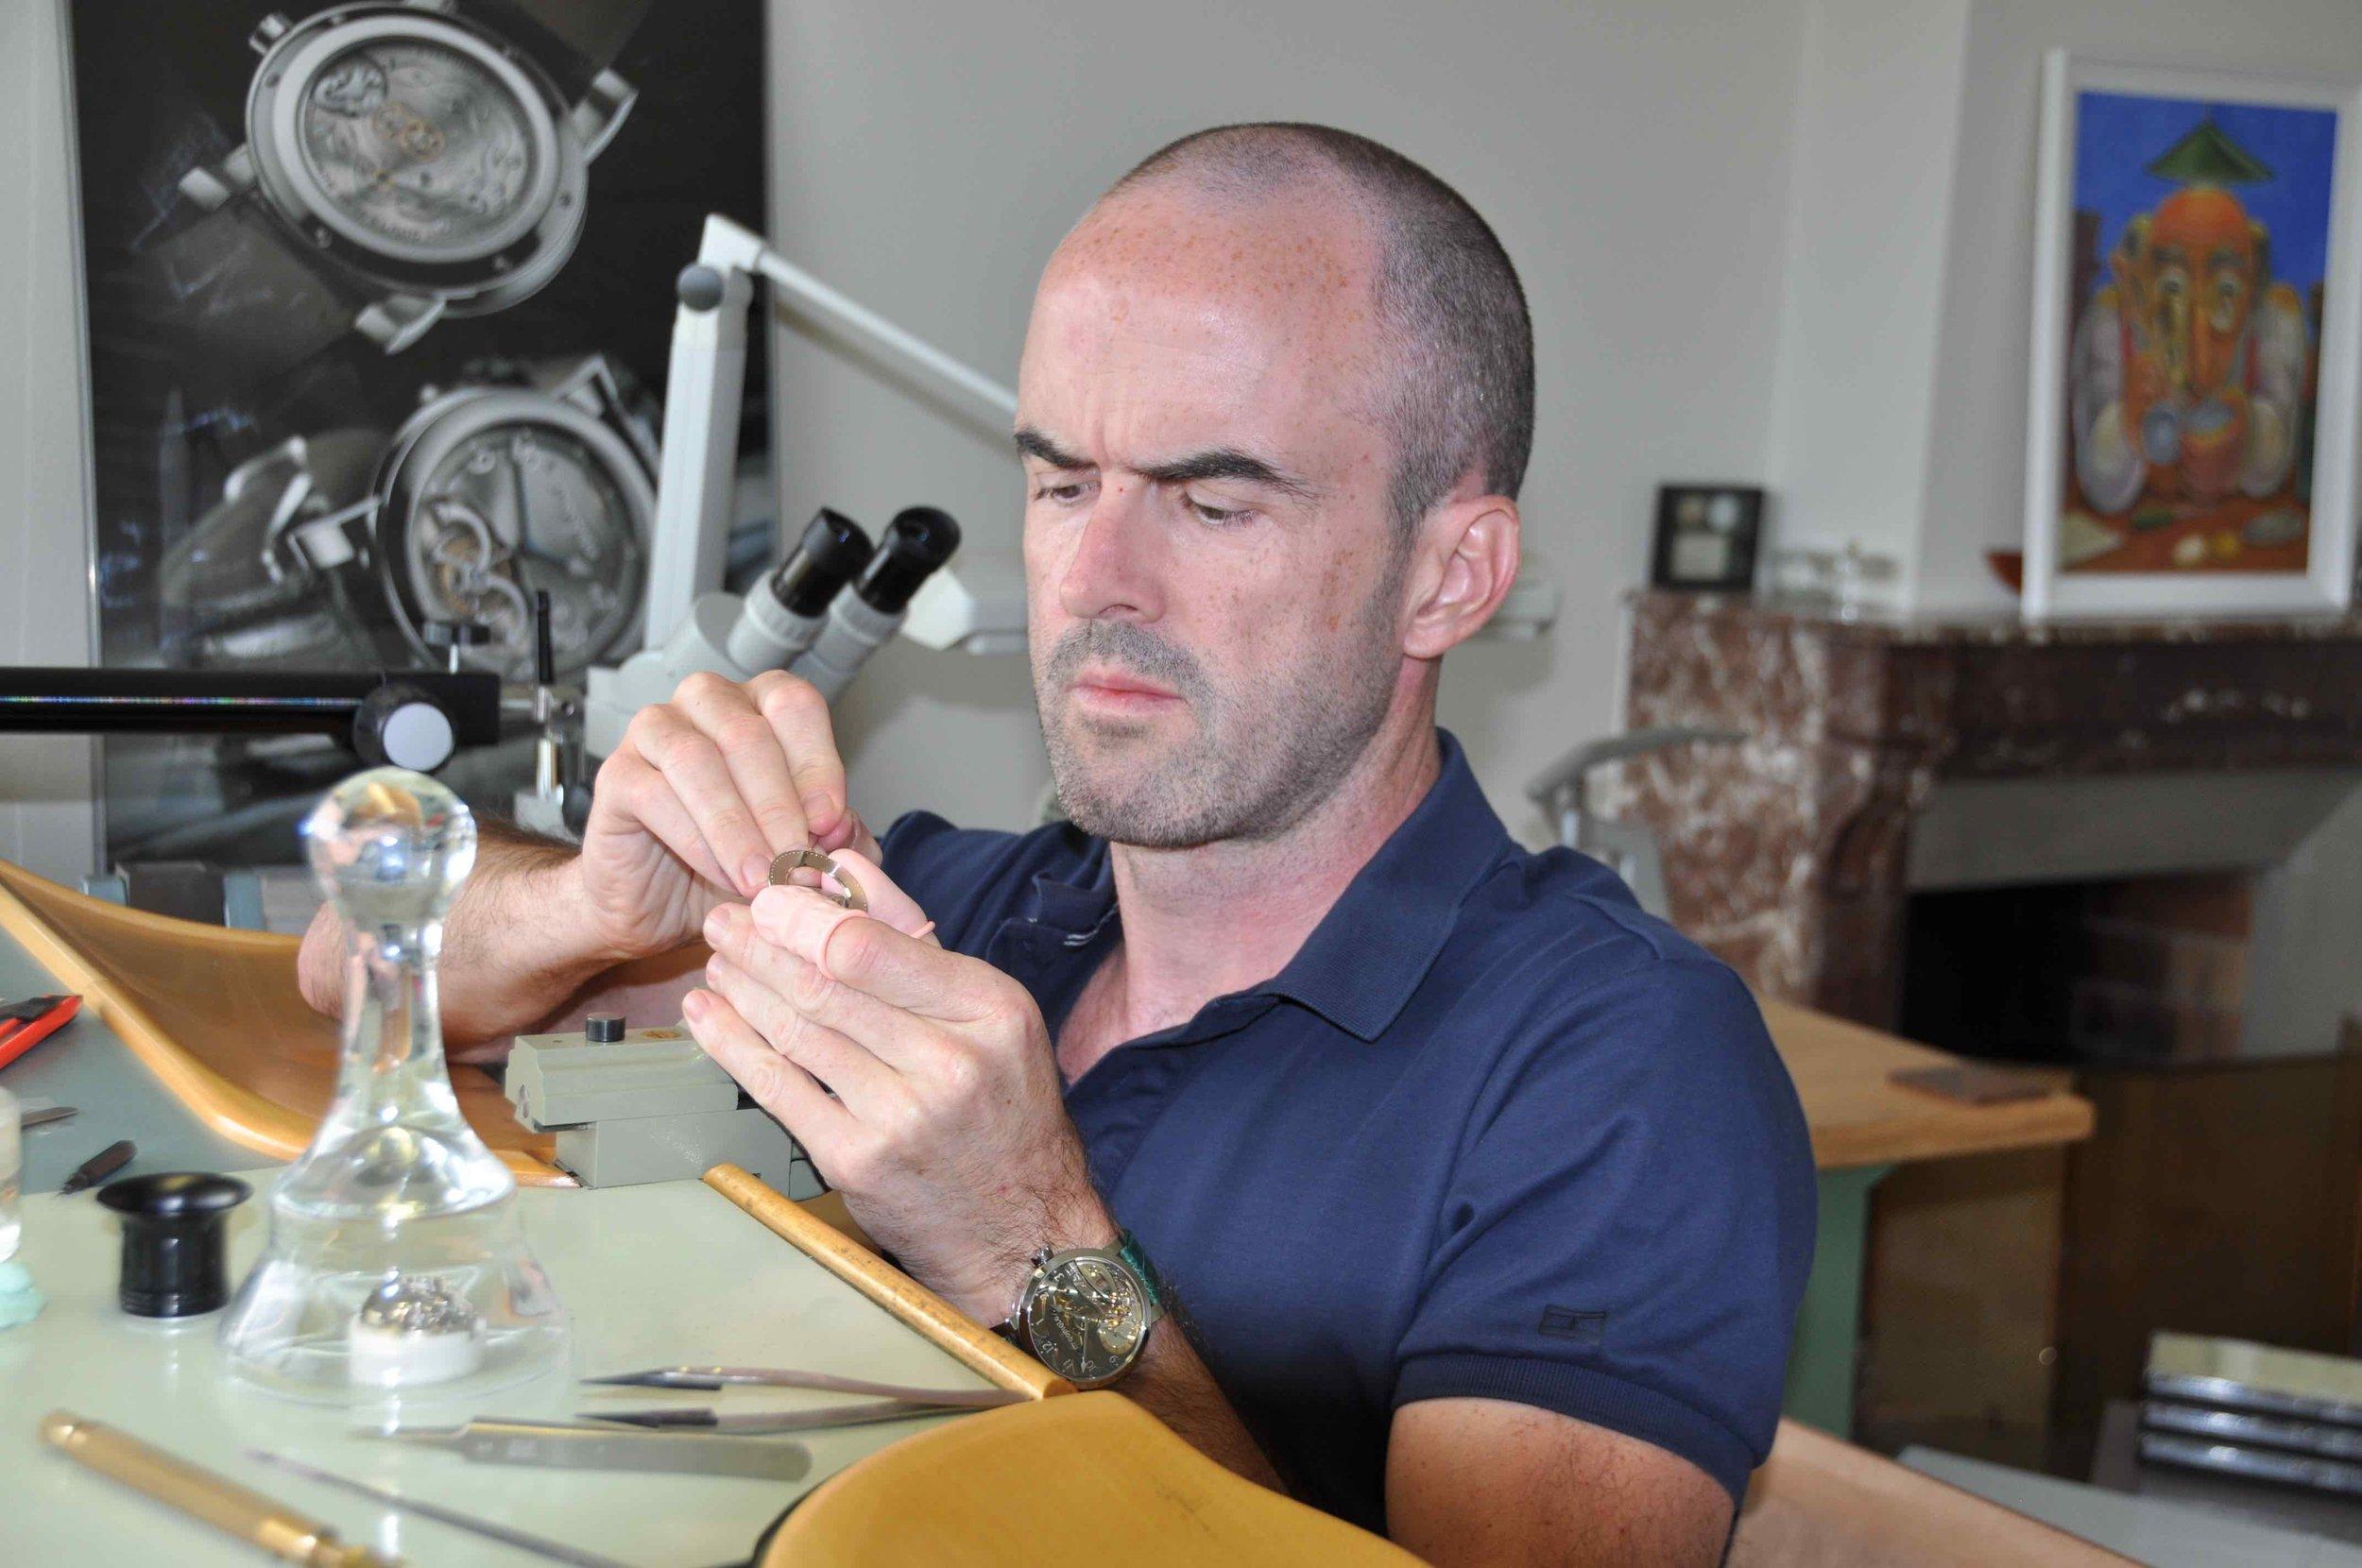 Stephen McGonigle (Watchmaker)